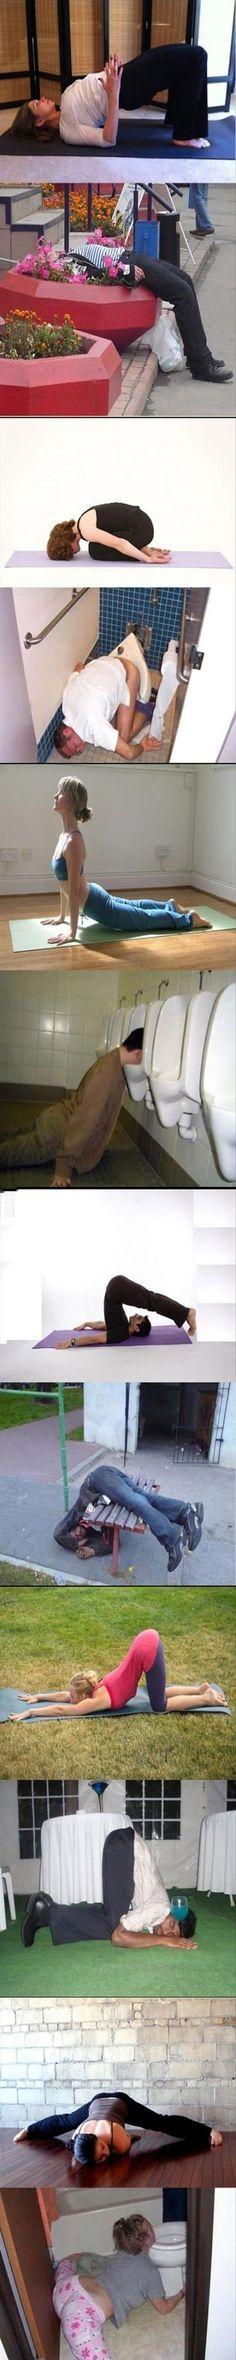 Dump A Day Yoga vs. Drunk Yoga - 12 Pics